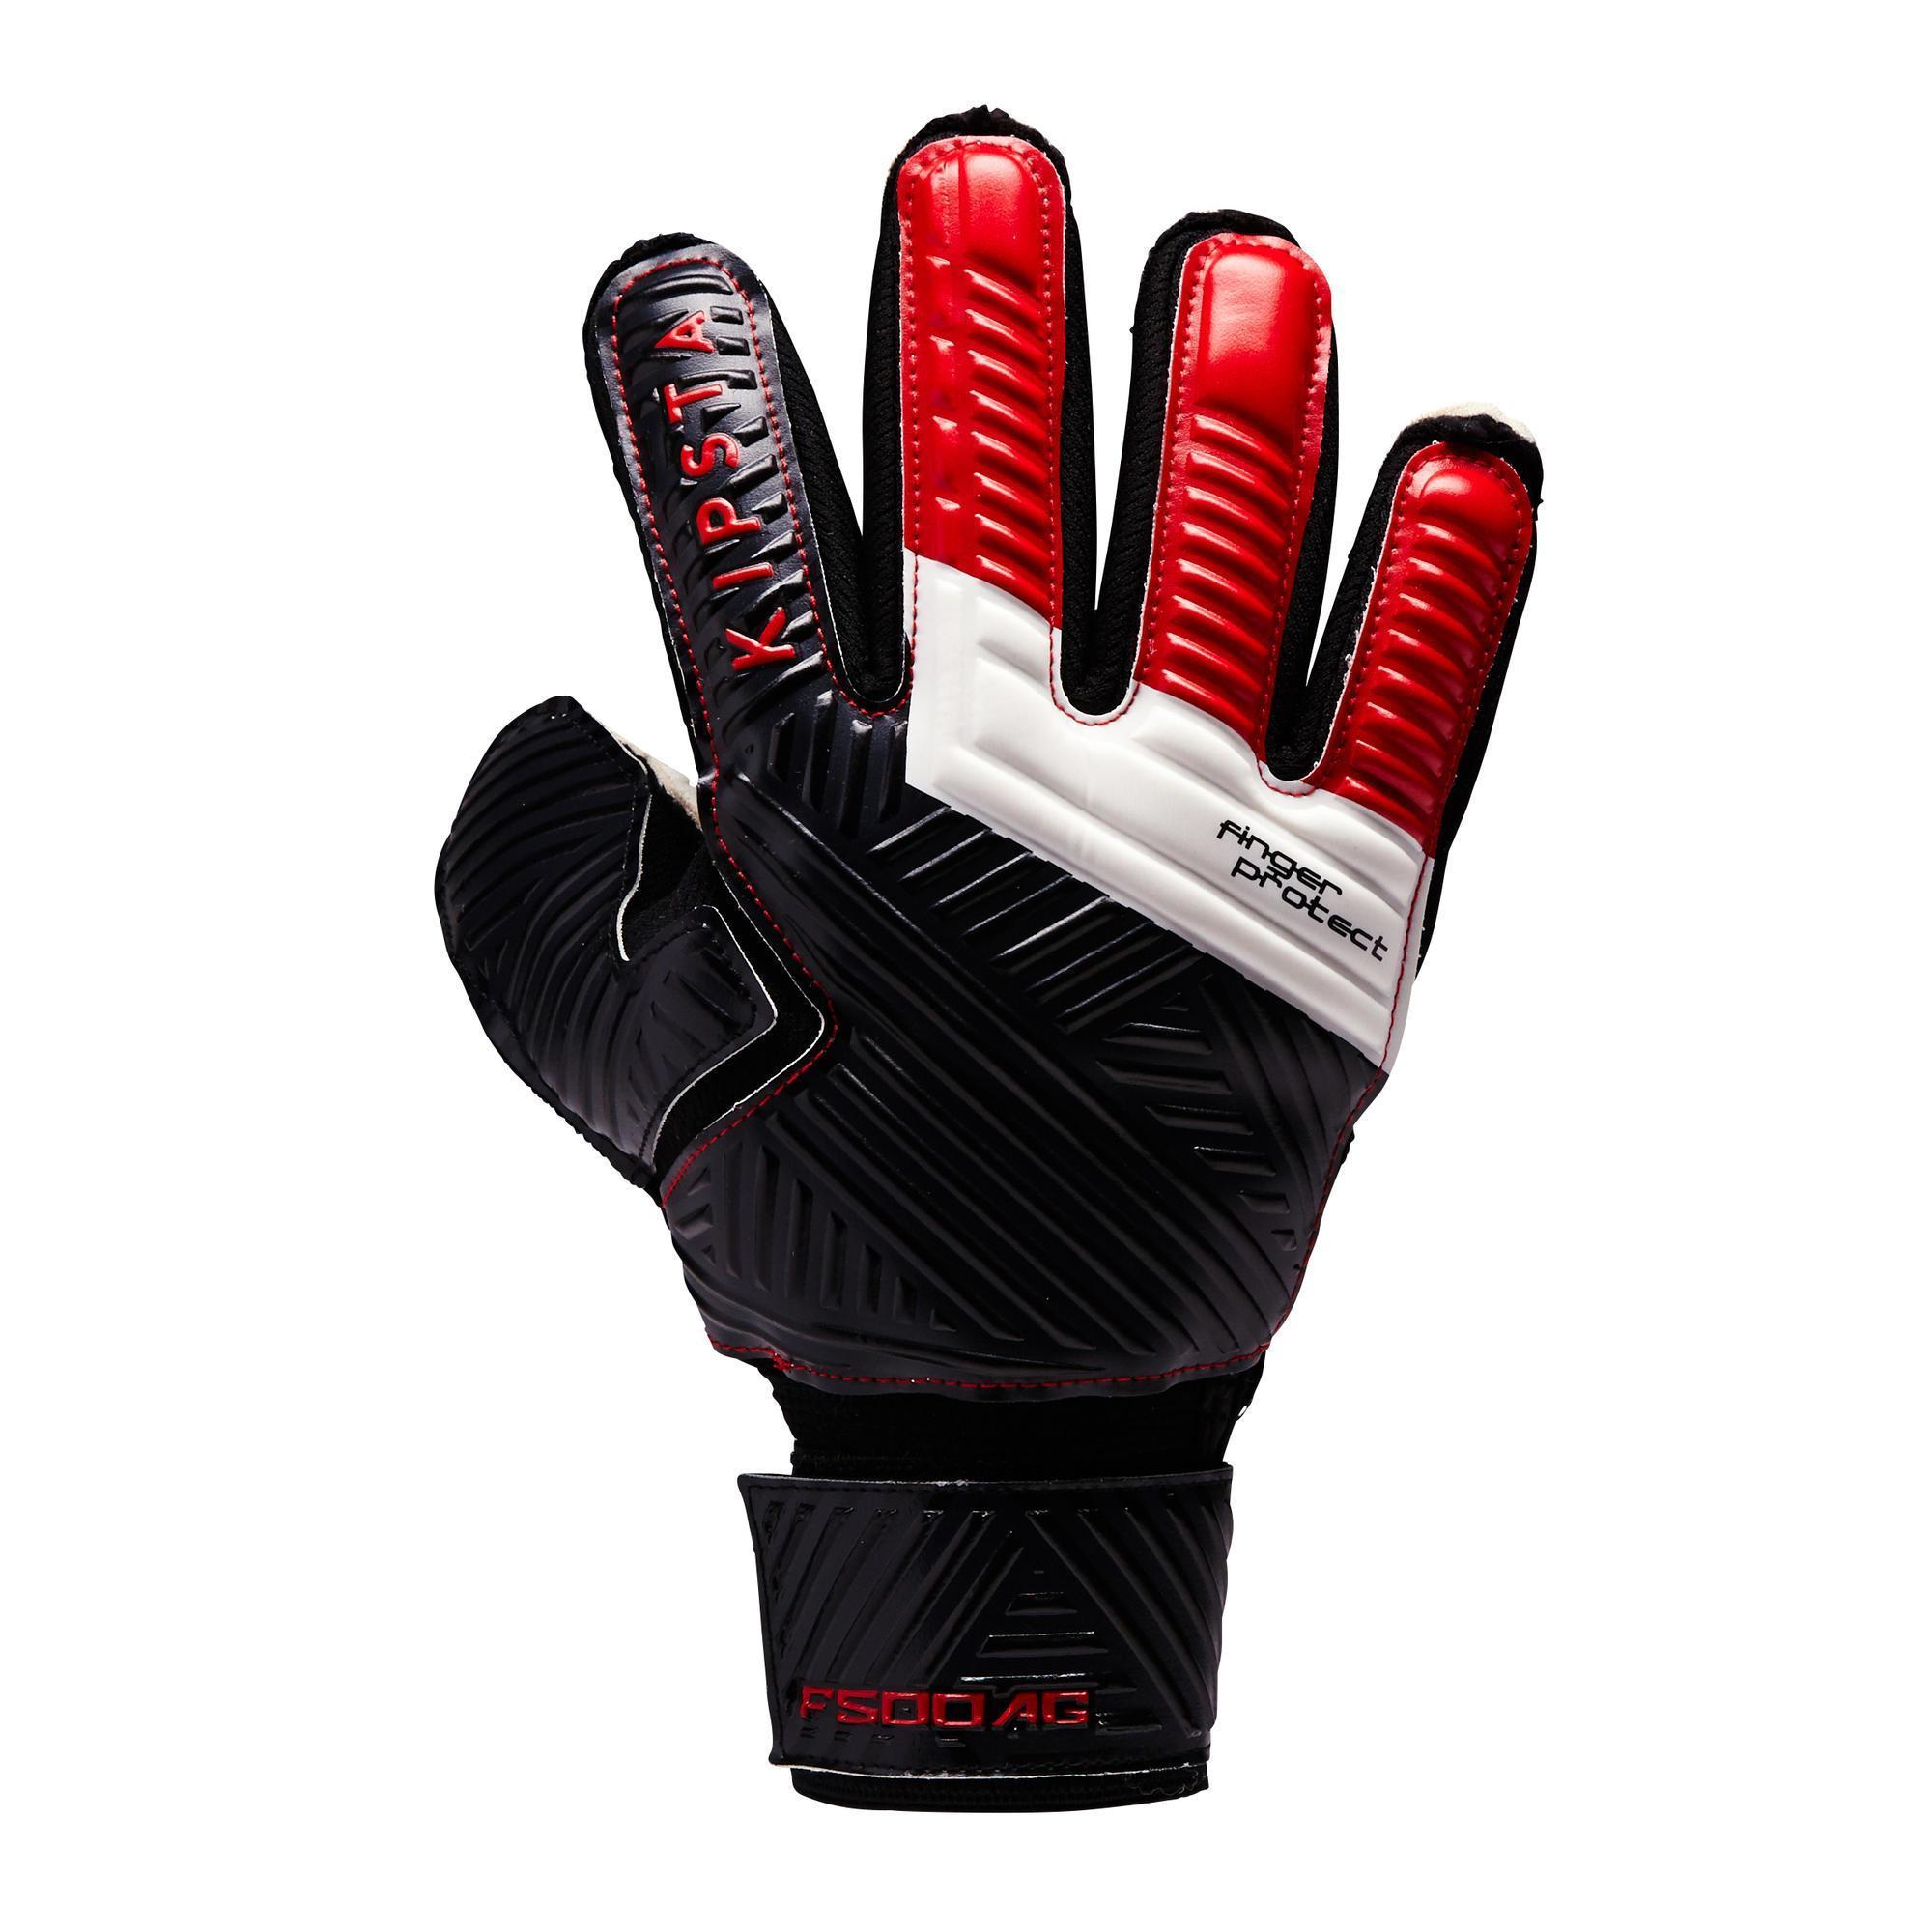 Kipsta Keepershandschoenen kind F500 AG kunstgras finger protect rood/zwart